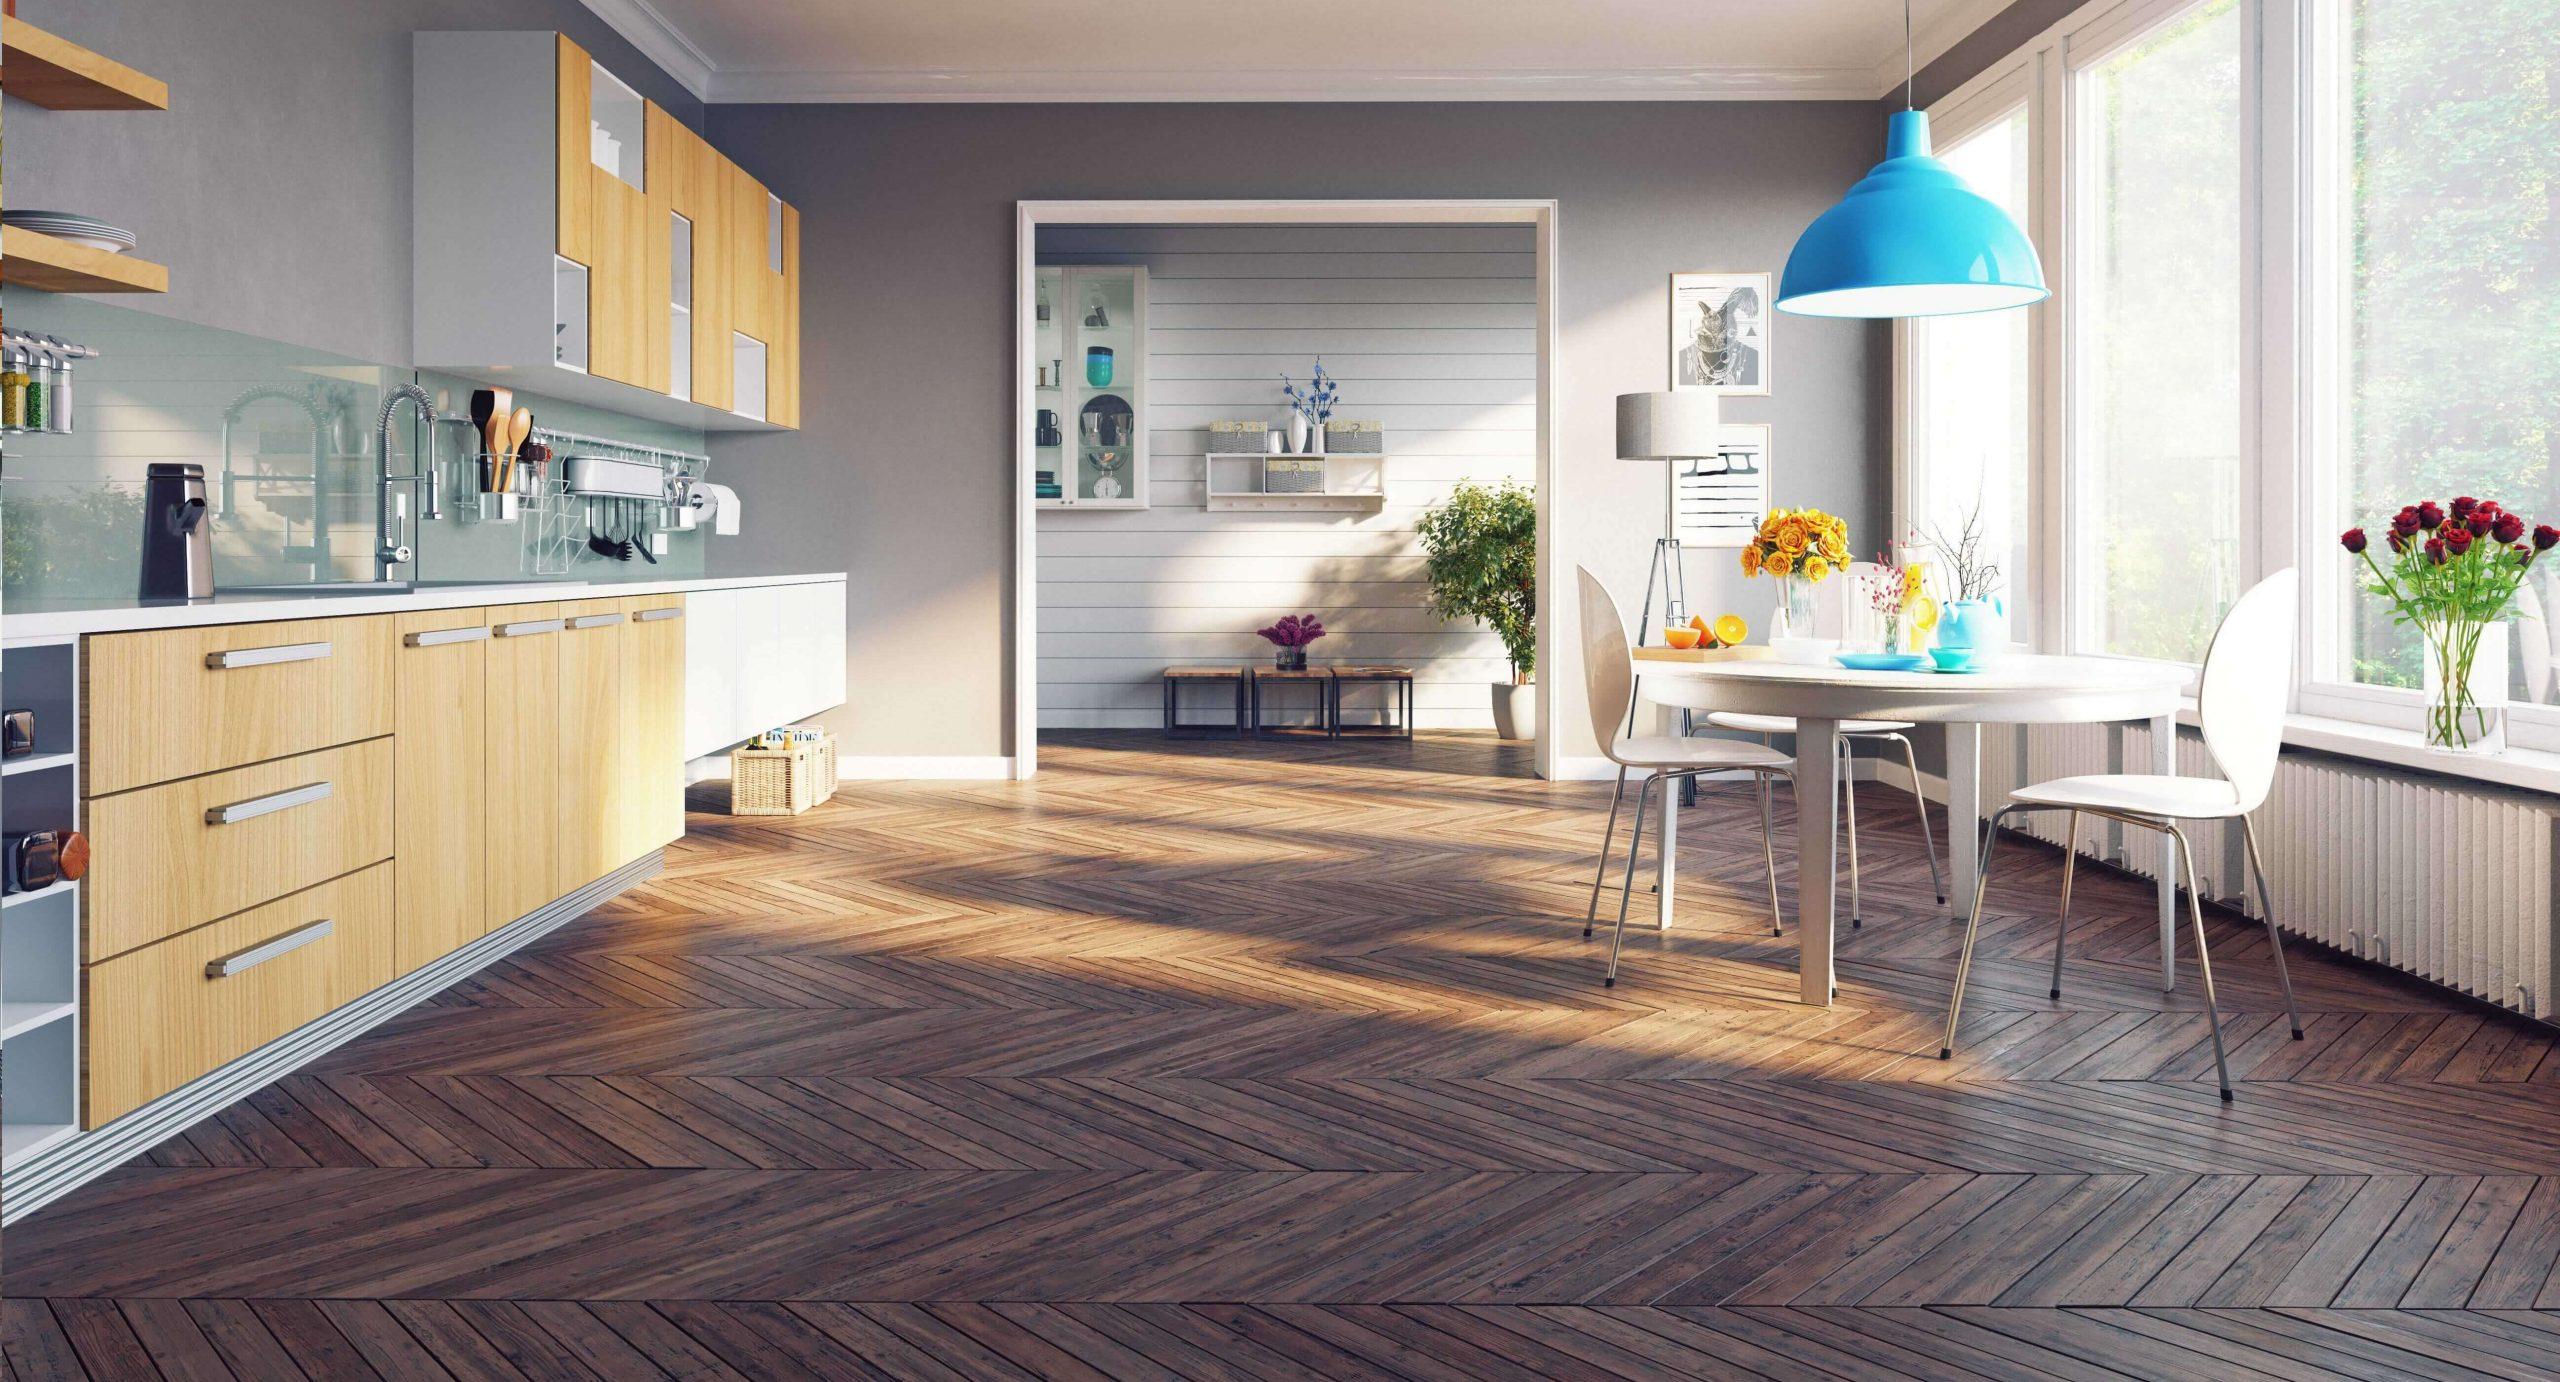 Full Size of Küche Boden Wechseln Bodenbeläge Küche Pvc Boden In Küche Bodenbelag Küche Obi Küche Bodenbelag Küche